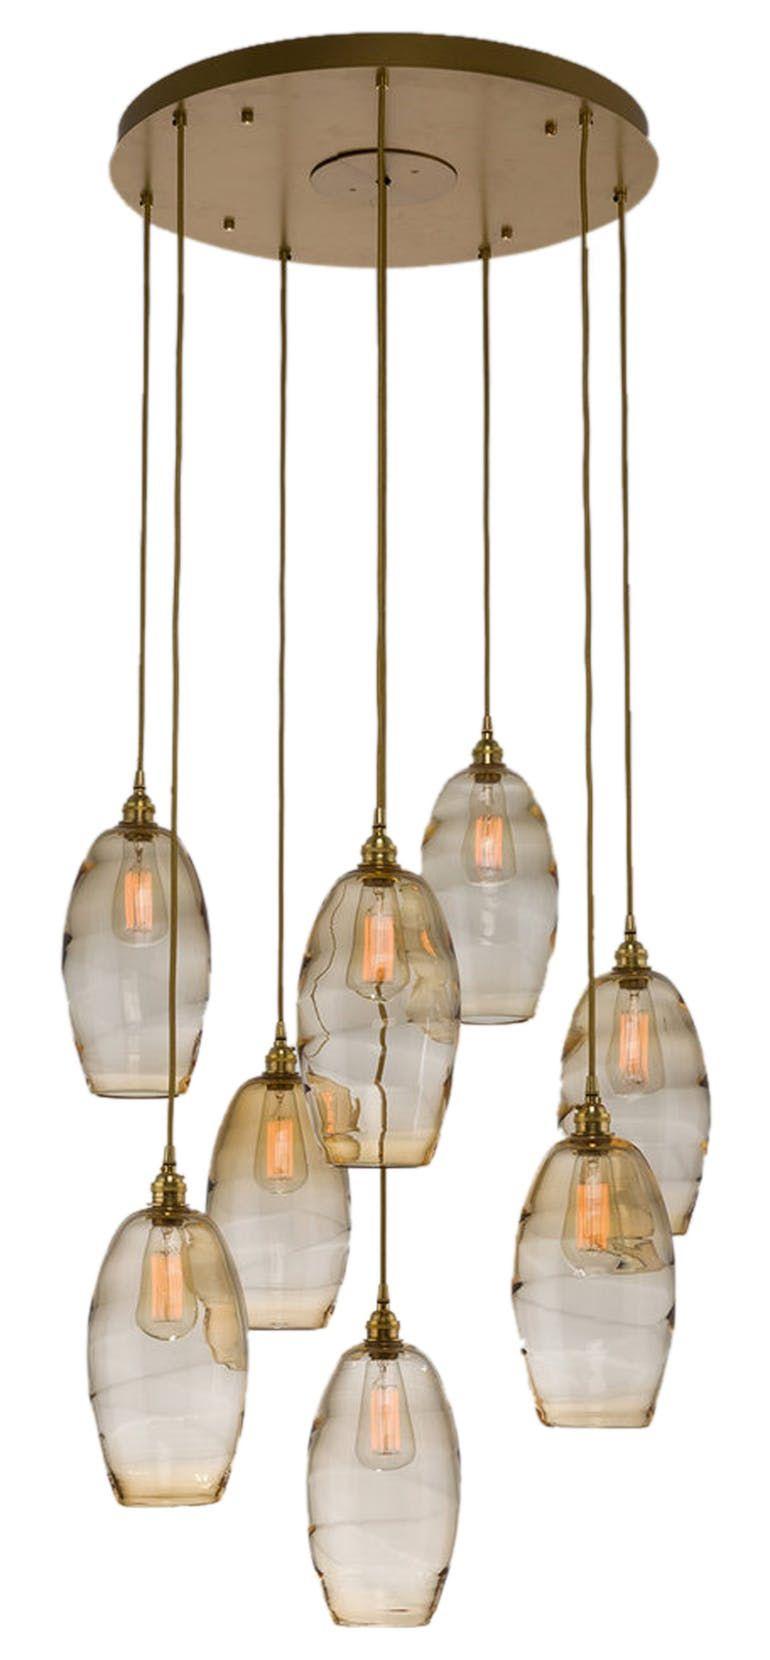 Ellisse large round multi port chandelier transitional chandeliers ellisse large round multi port chandelier arubaitofo Images